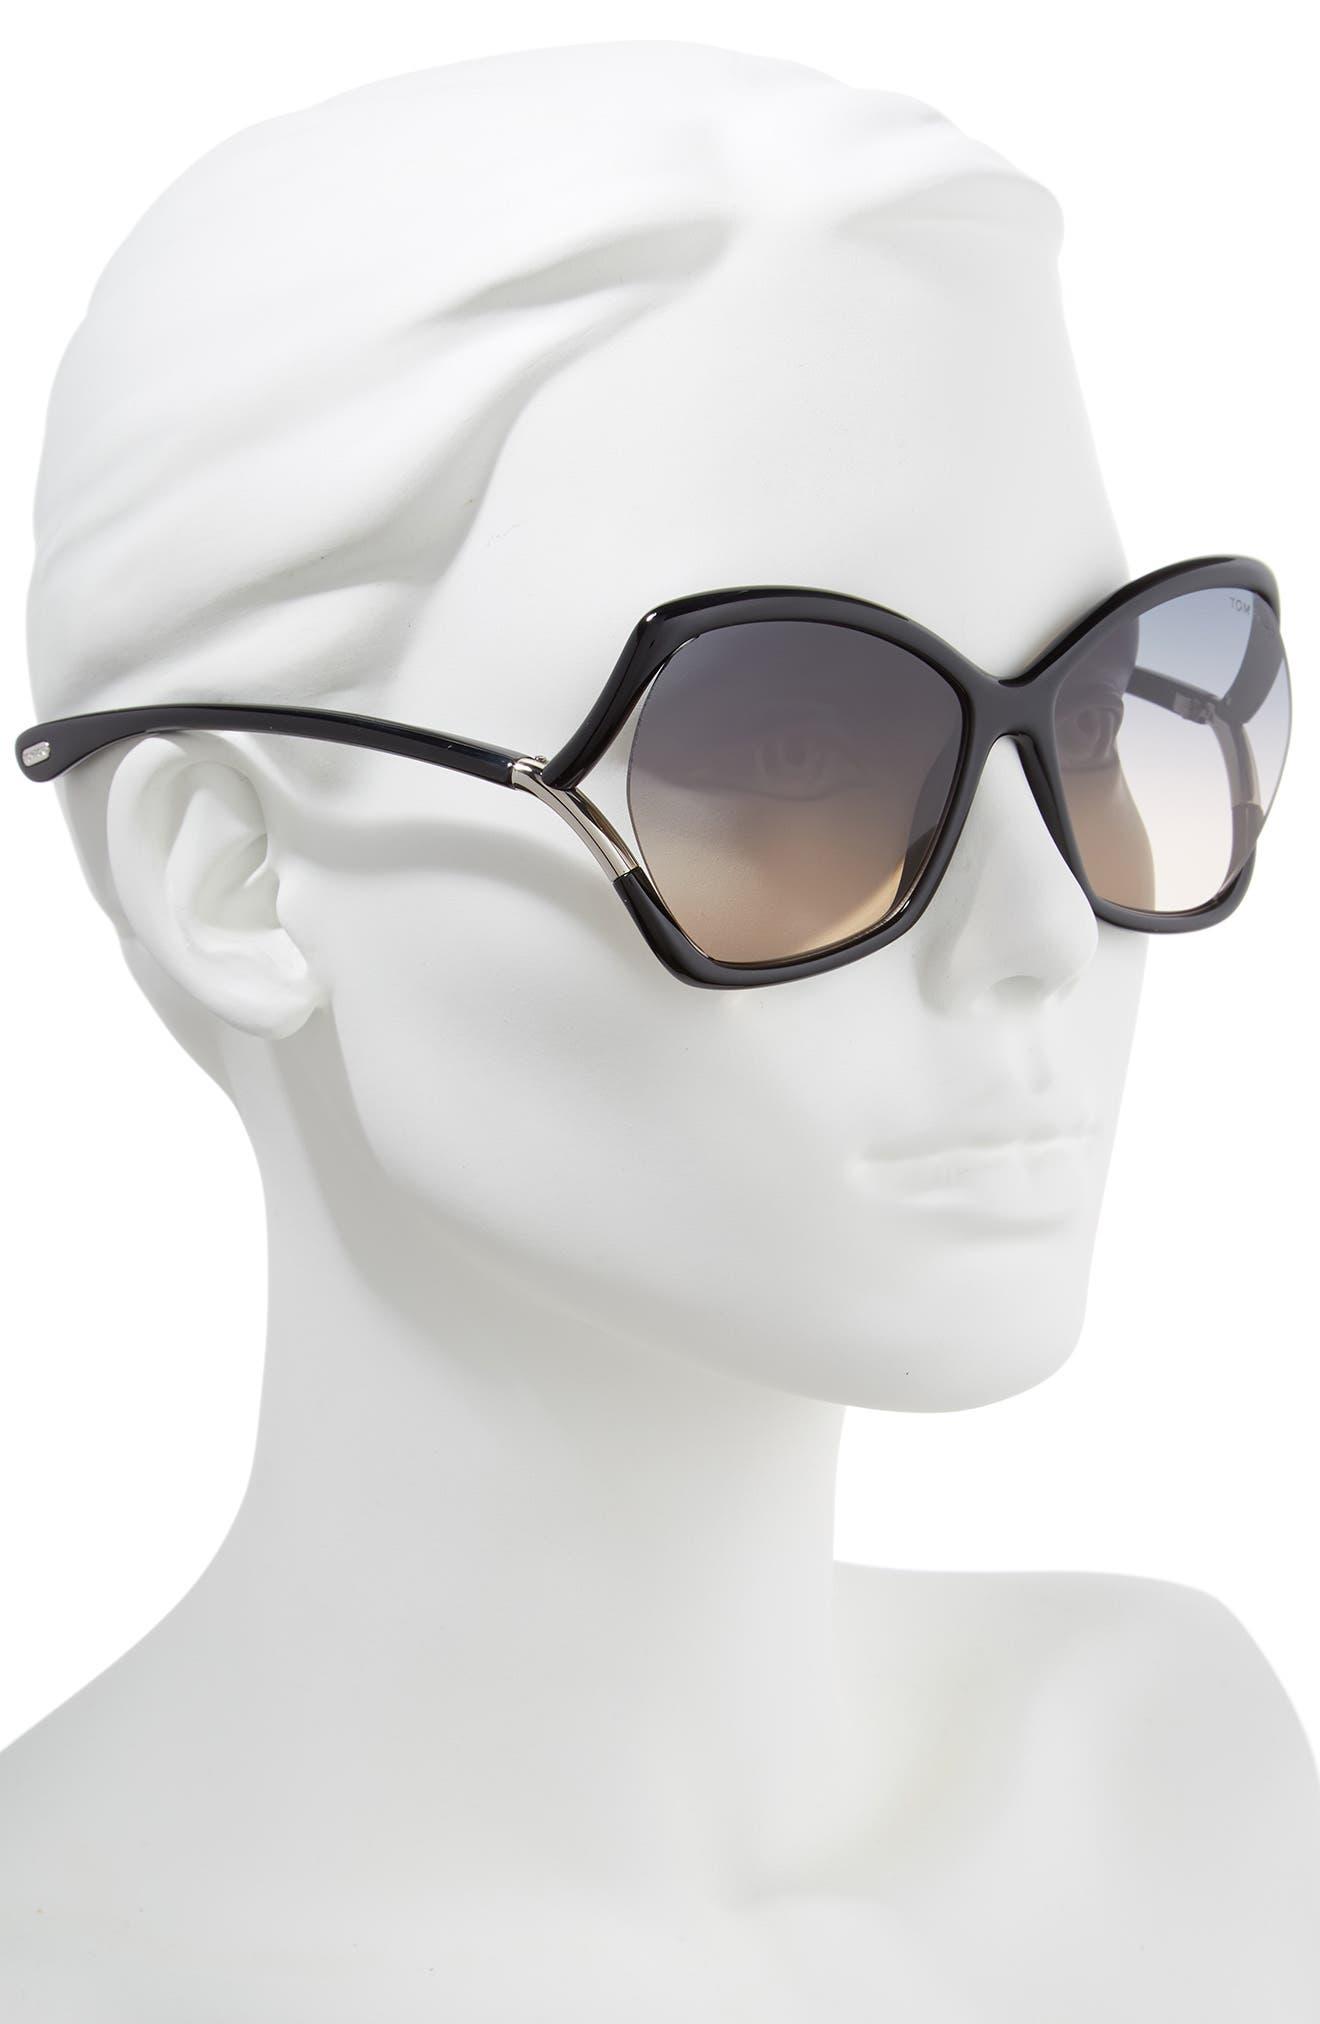 Astrid 61mm Geometric Sunglasses,                             Alternate thumbnail 2, color,                             SHINY BLACK/ GRADIENT SMOKE